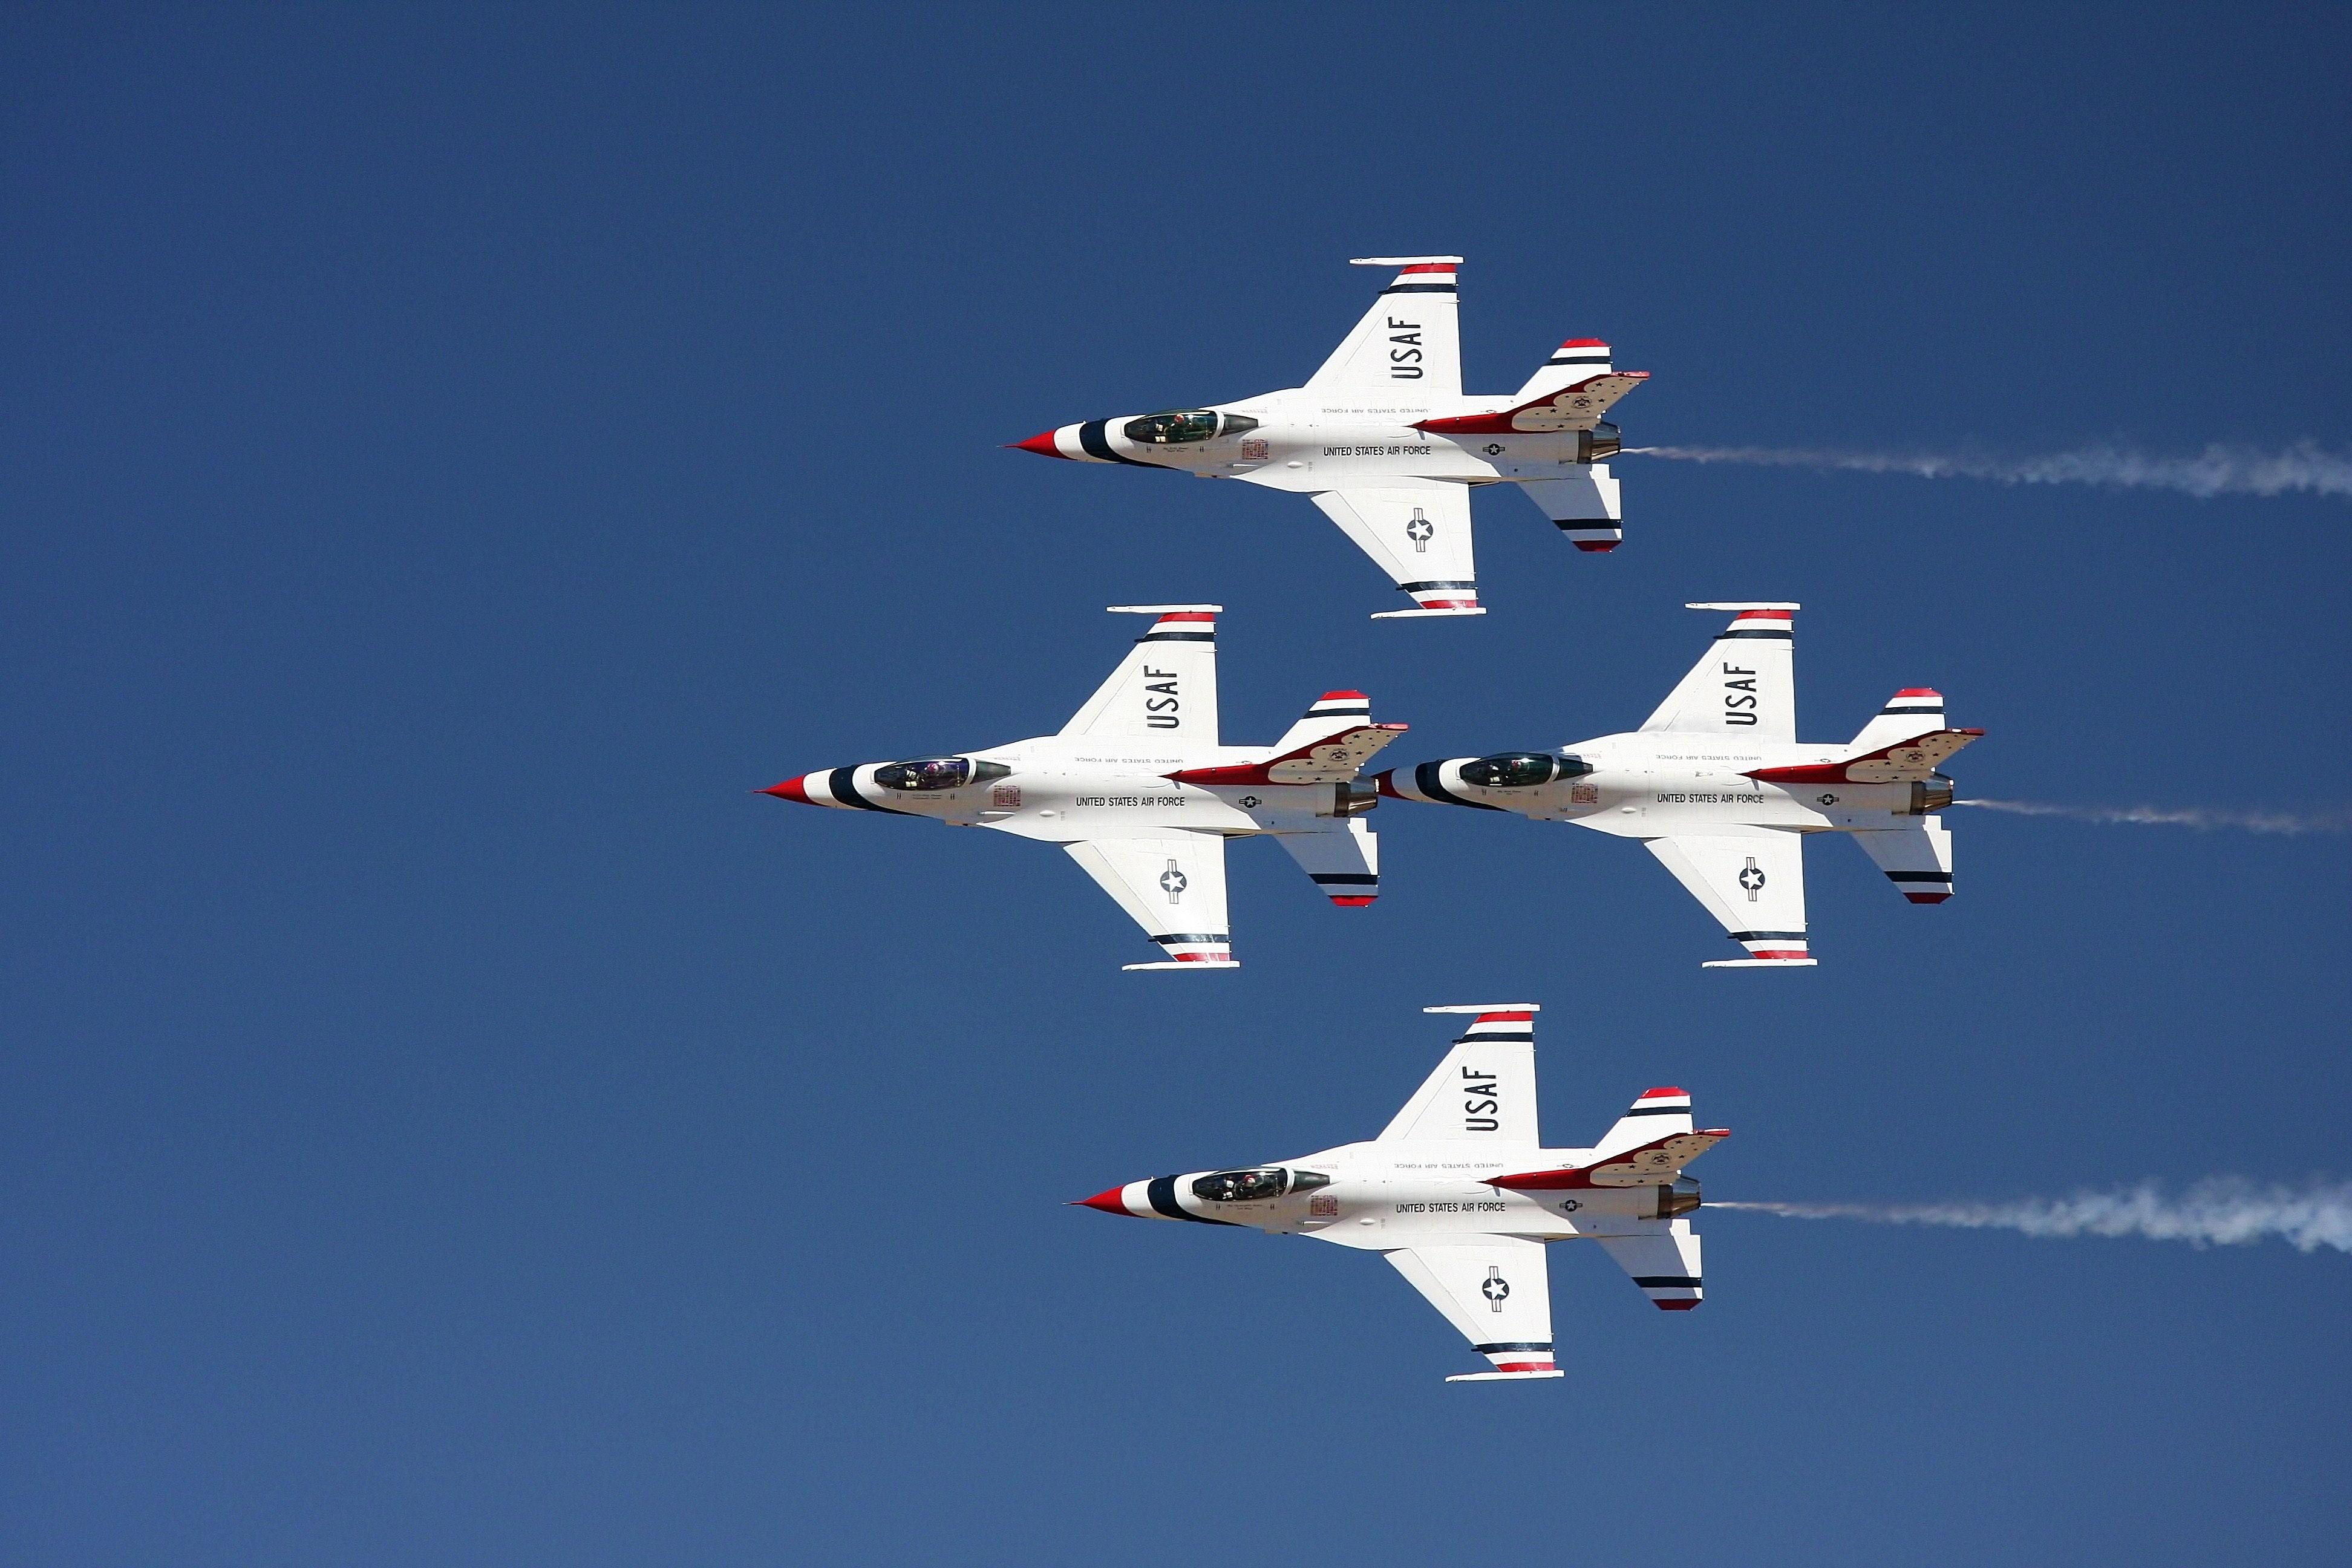 USAF-Air-Show-Aircraft